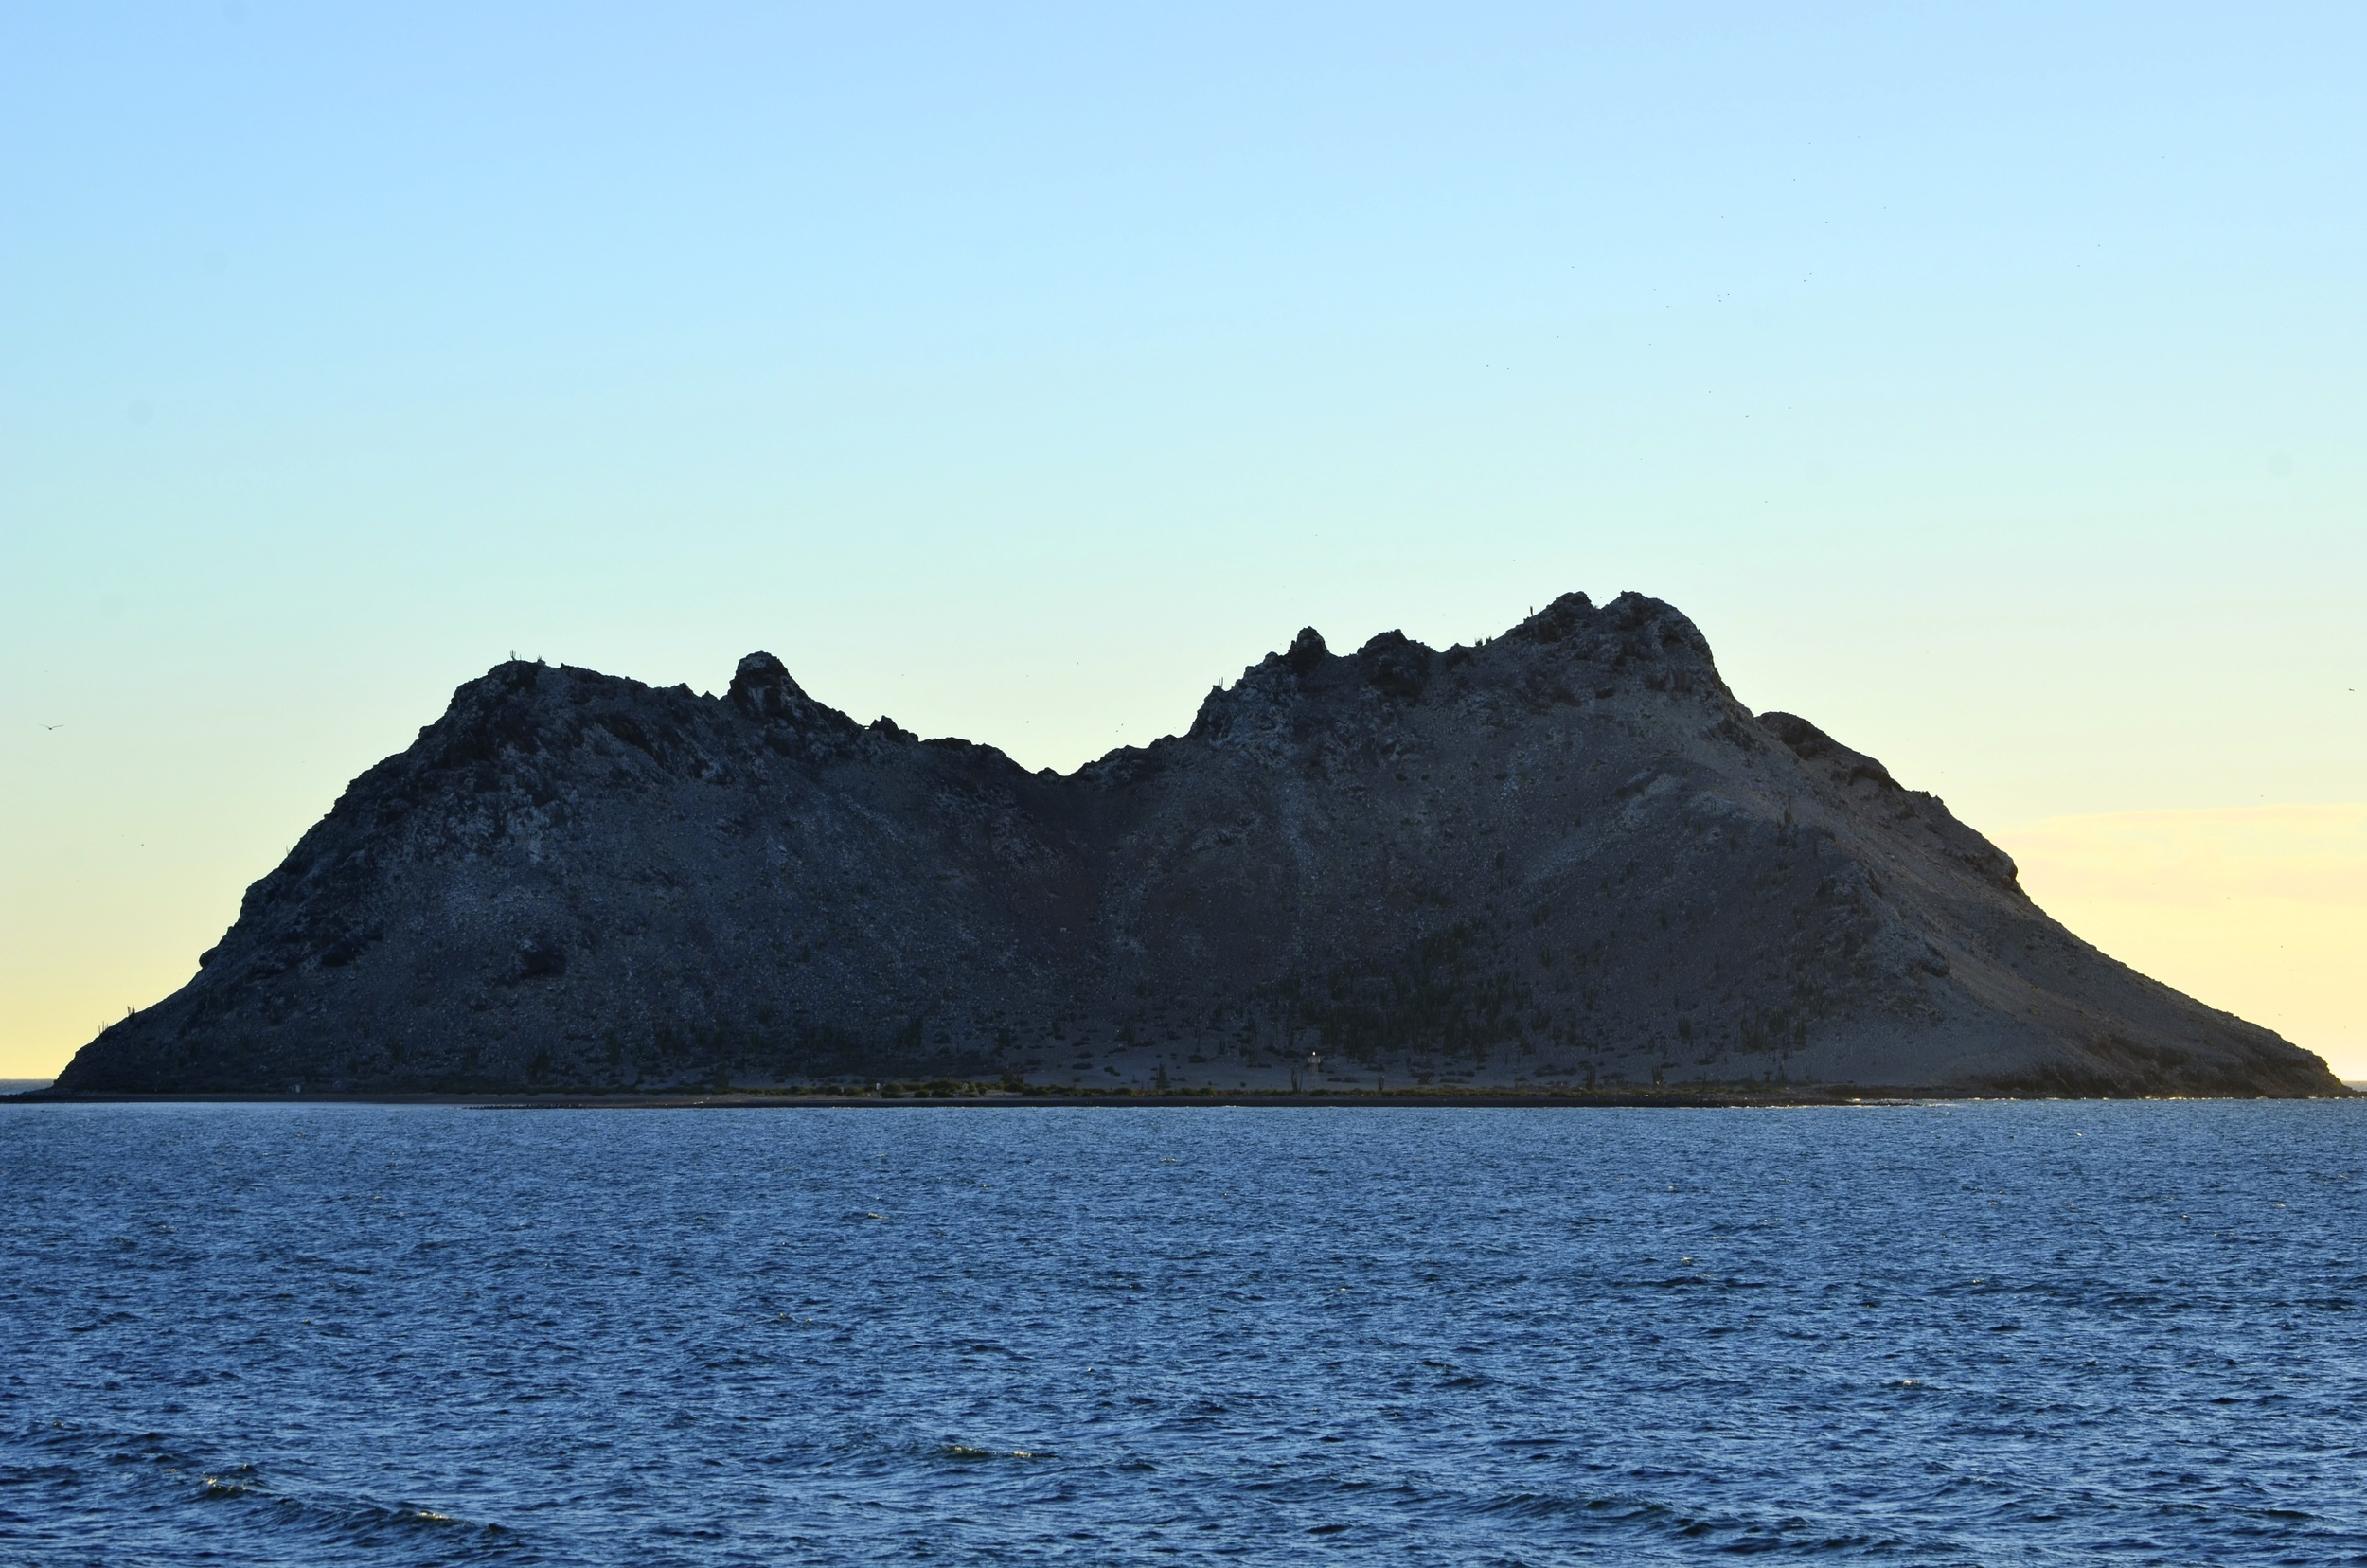 The Island of Alcatraz off Bahia de Kino's coast.